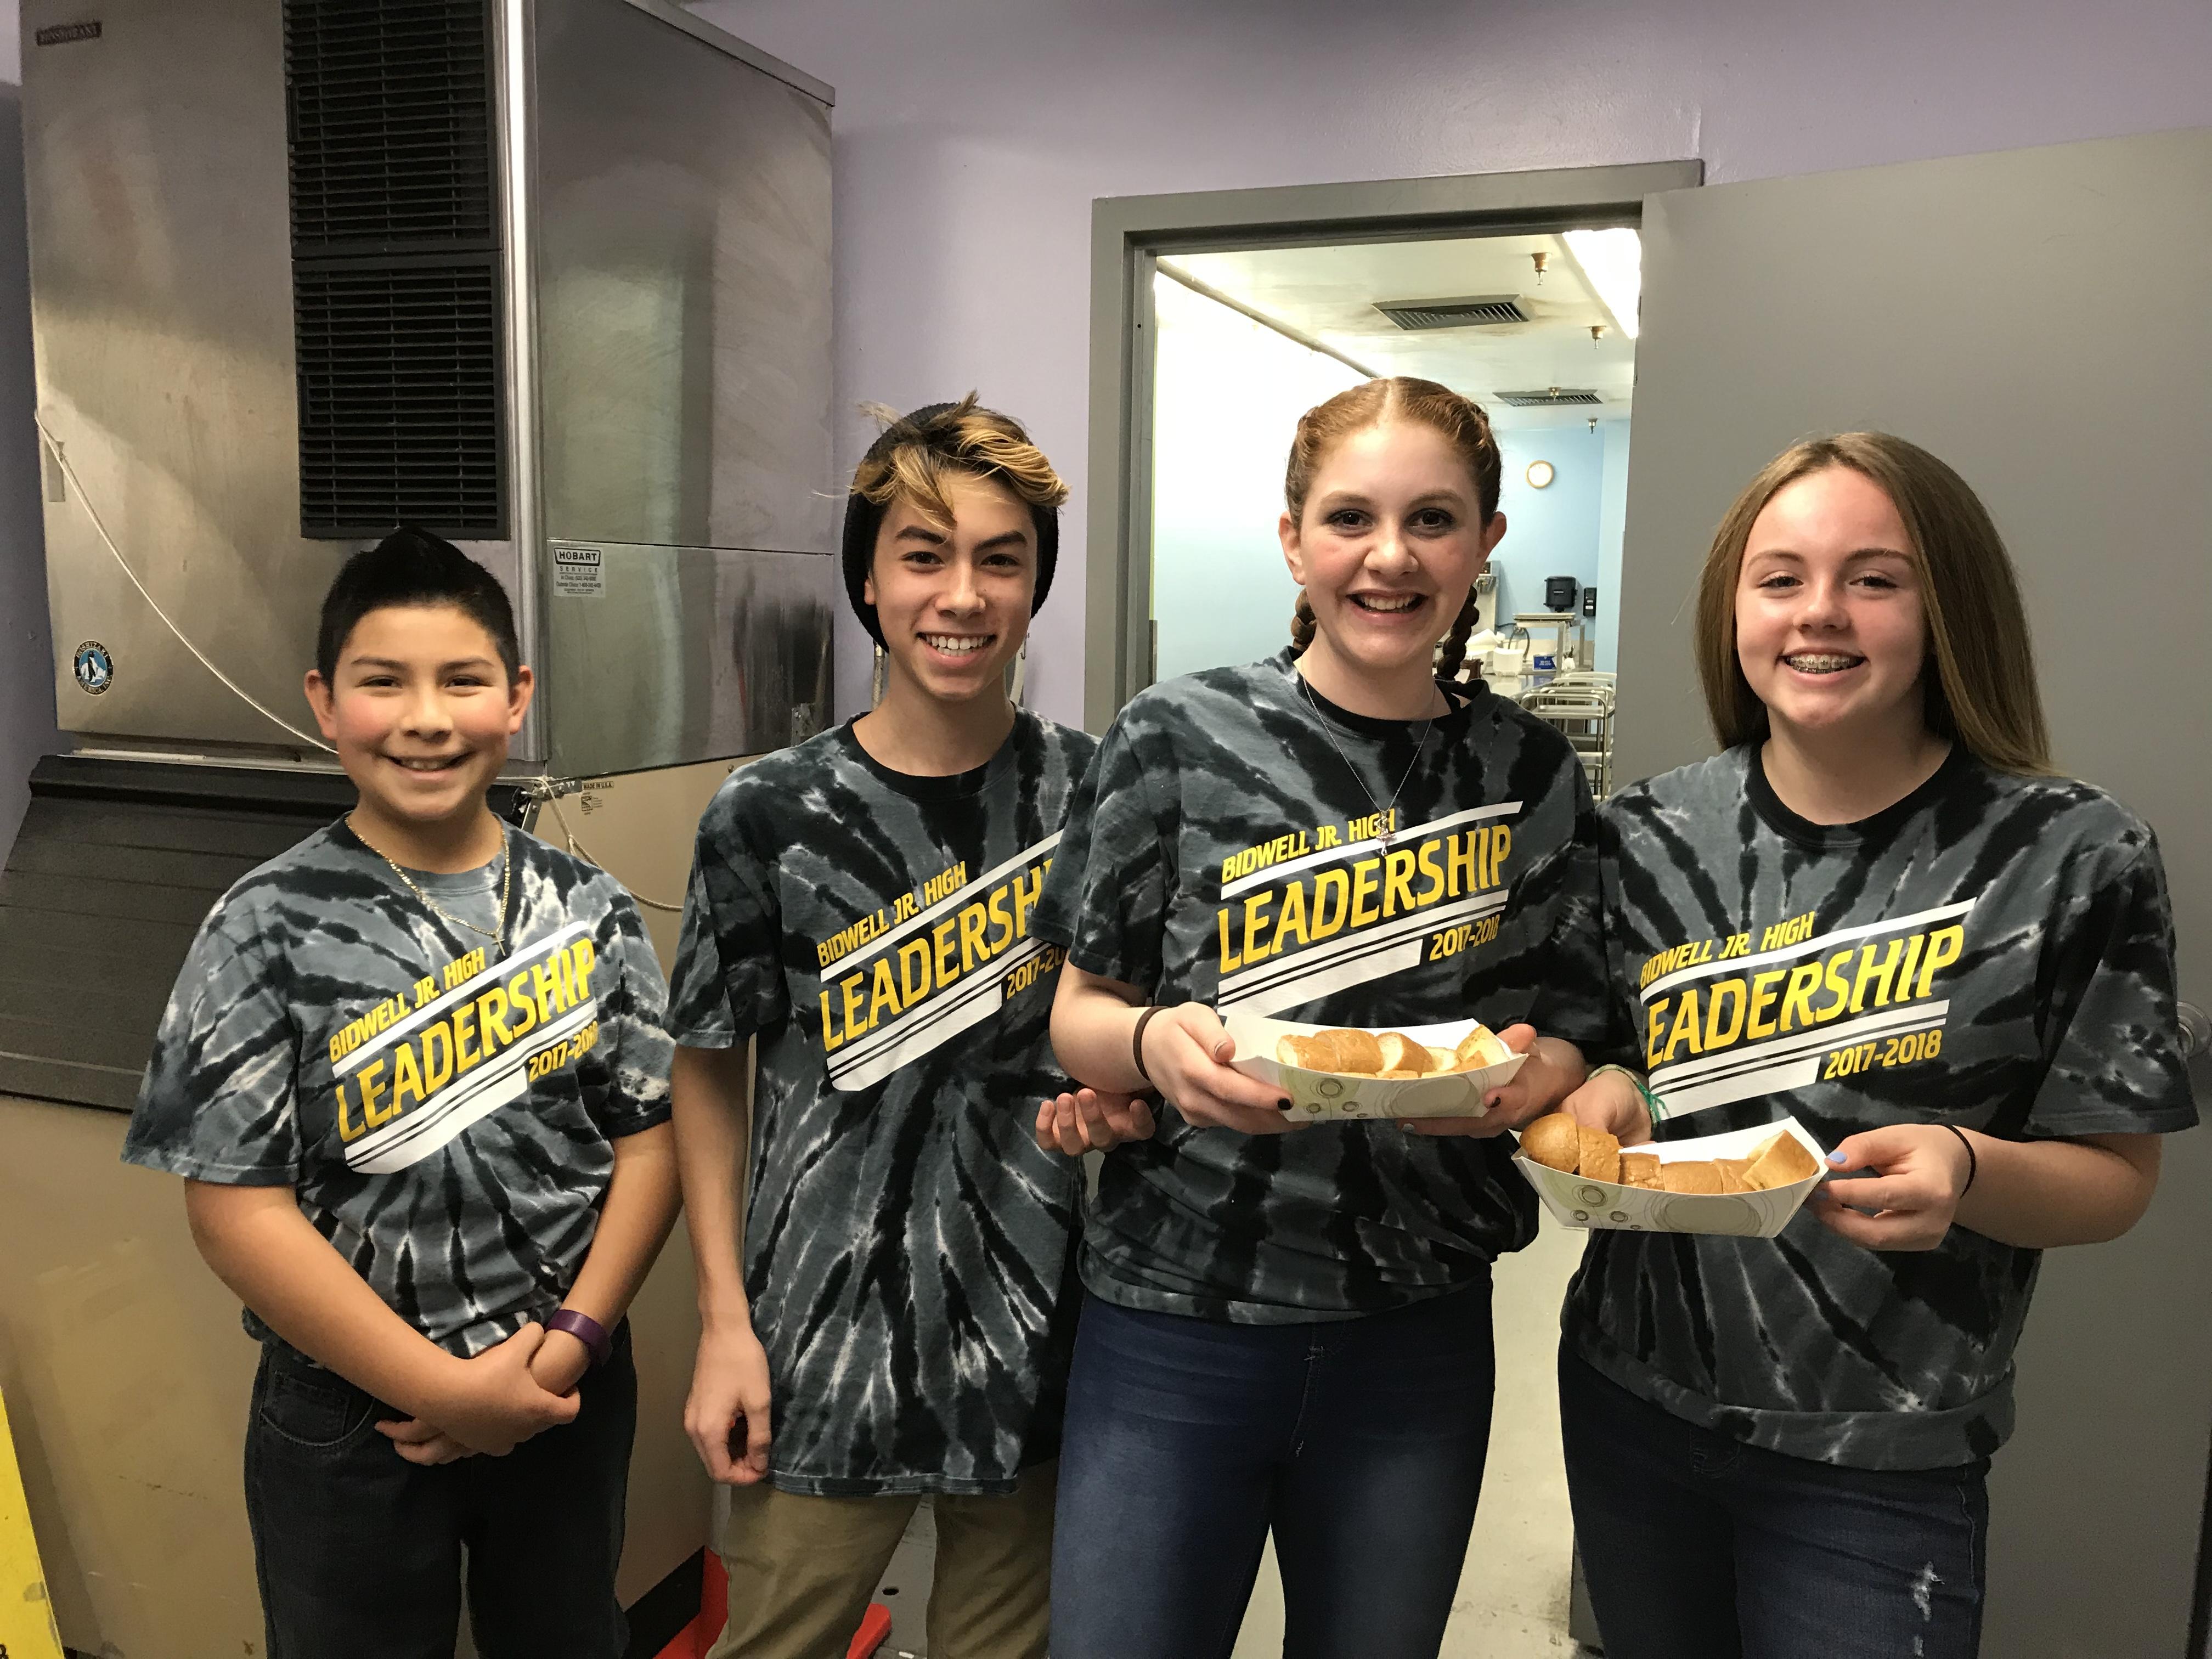 Bidwell Junior High School Leadership